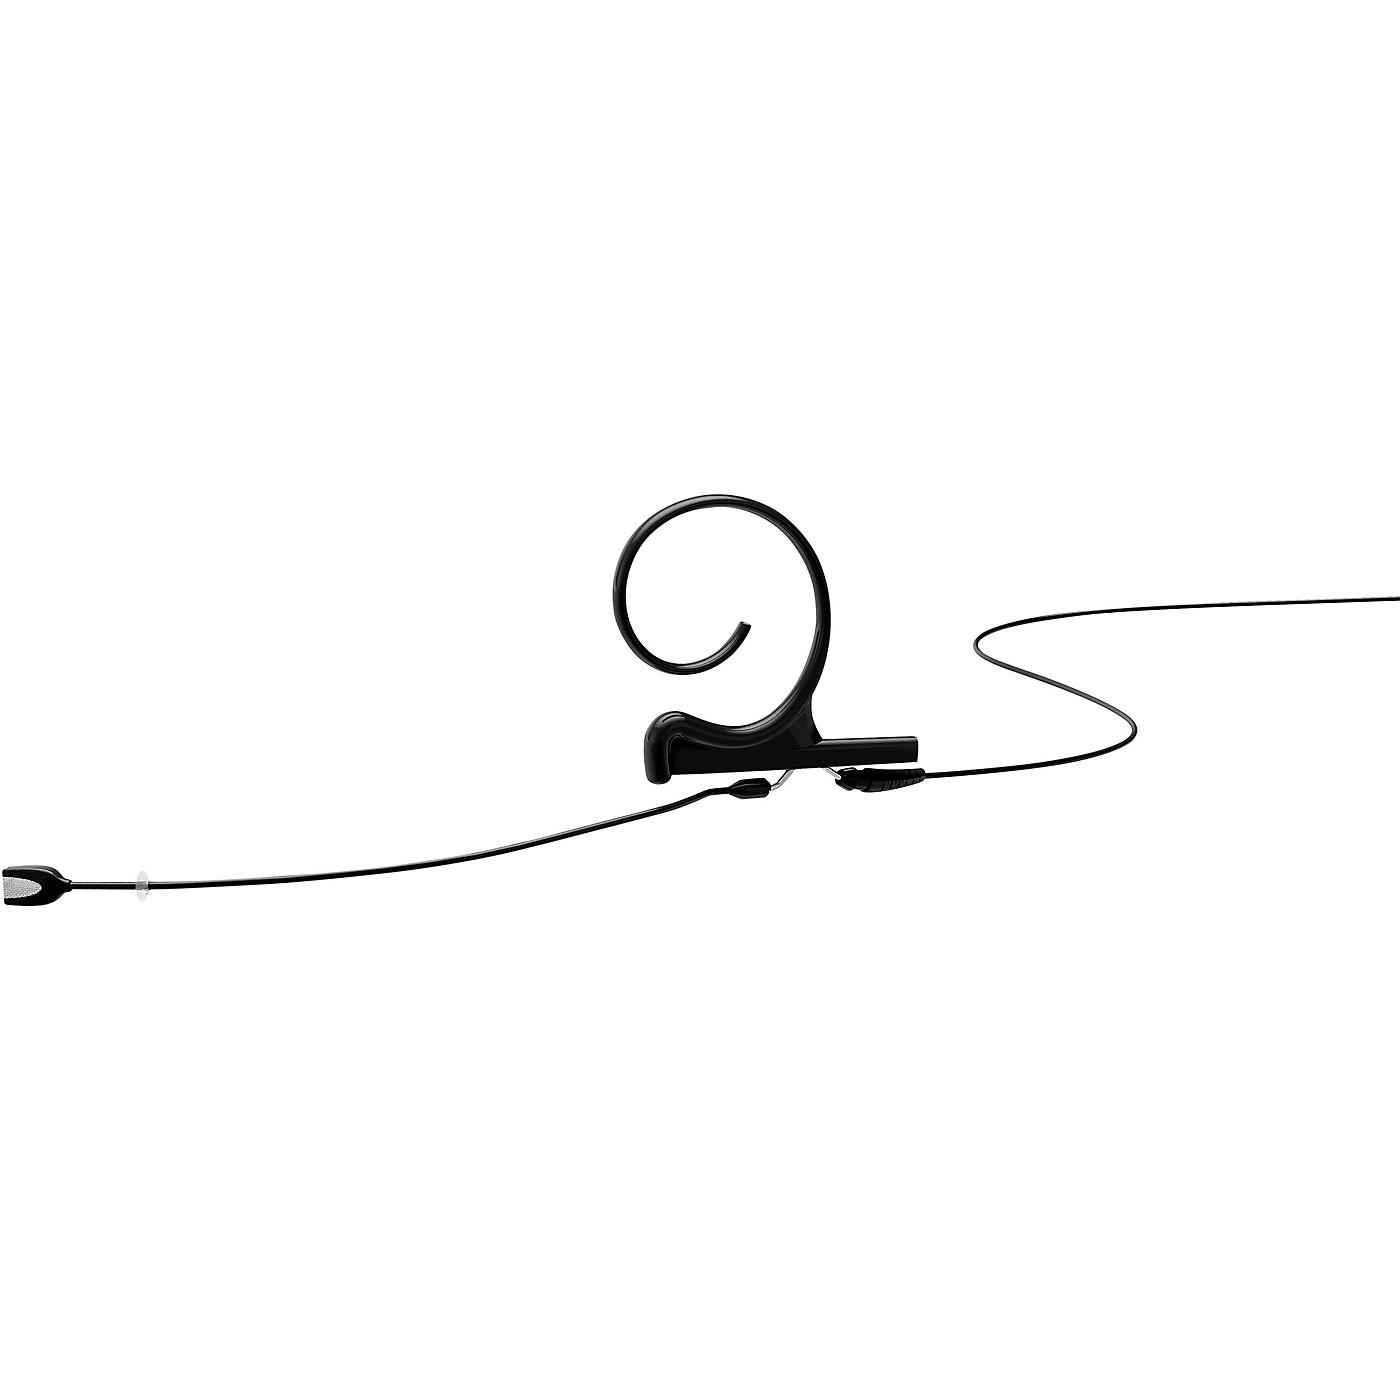 DPA Microphones d:fine FIO Slim Omnidirectional Headset Microphone—Single Ear, 90mm Boom, Microdot Connector, Black thumbnail